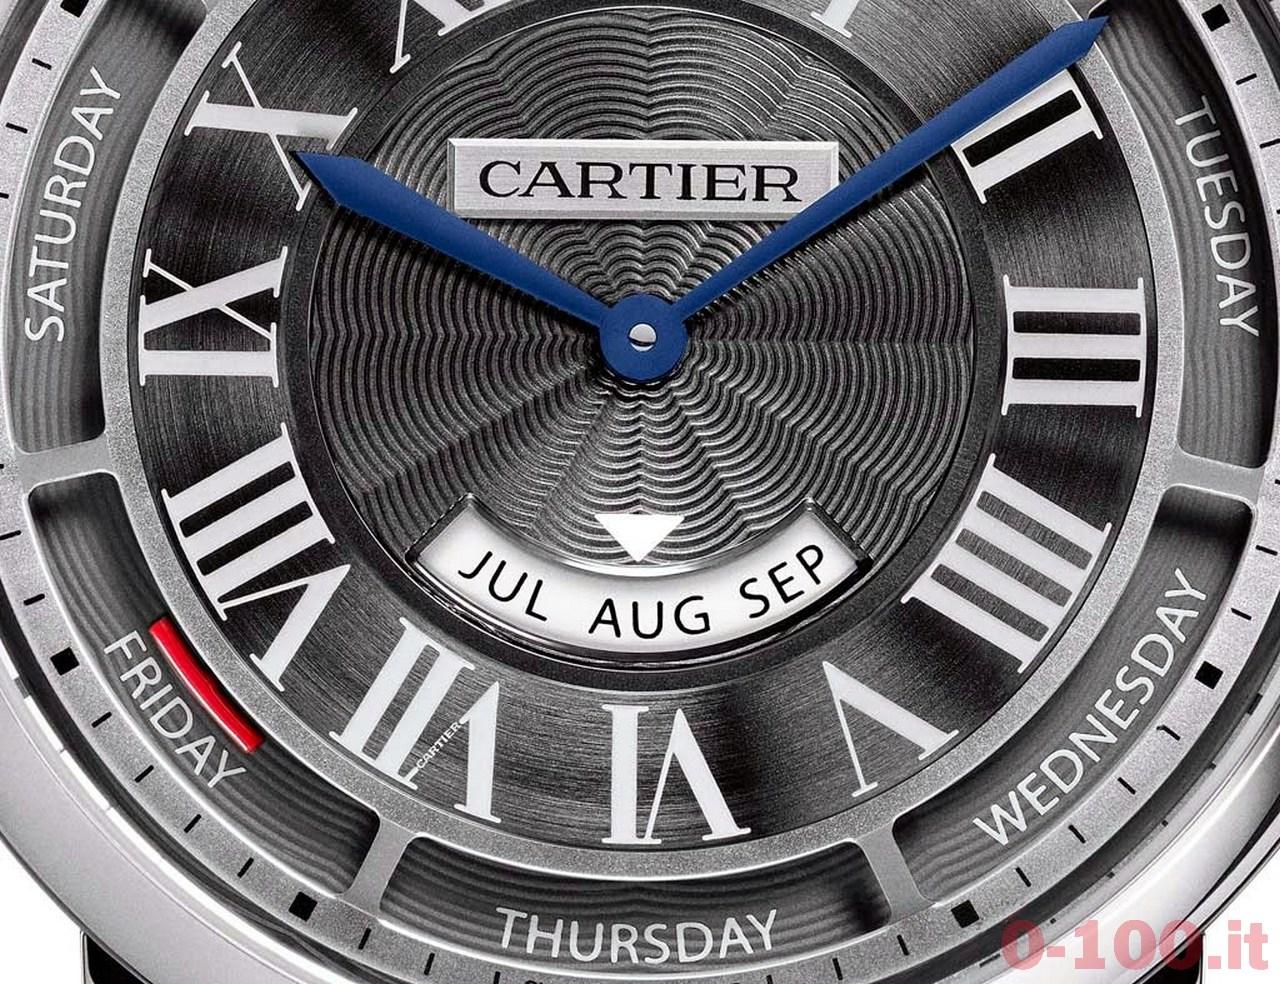 anteprima-sihh-2015-cartier-rotonde-annual-calendar-40mm_0-100_4